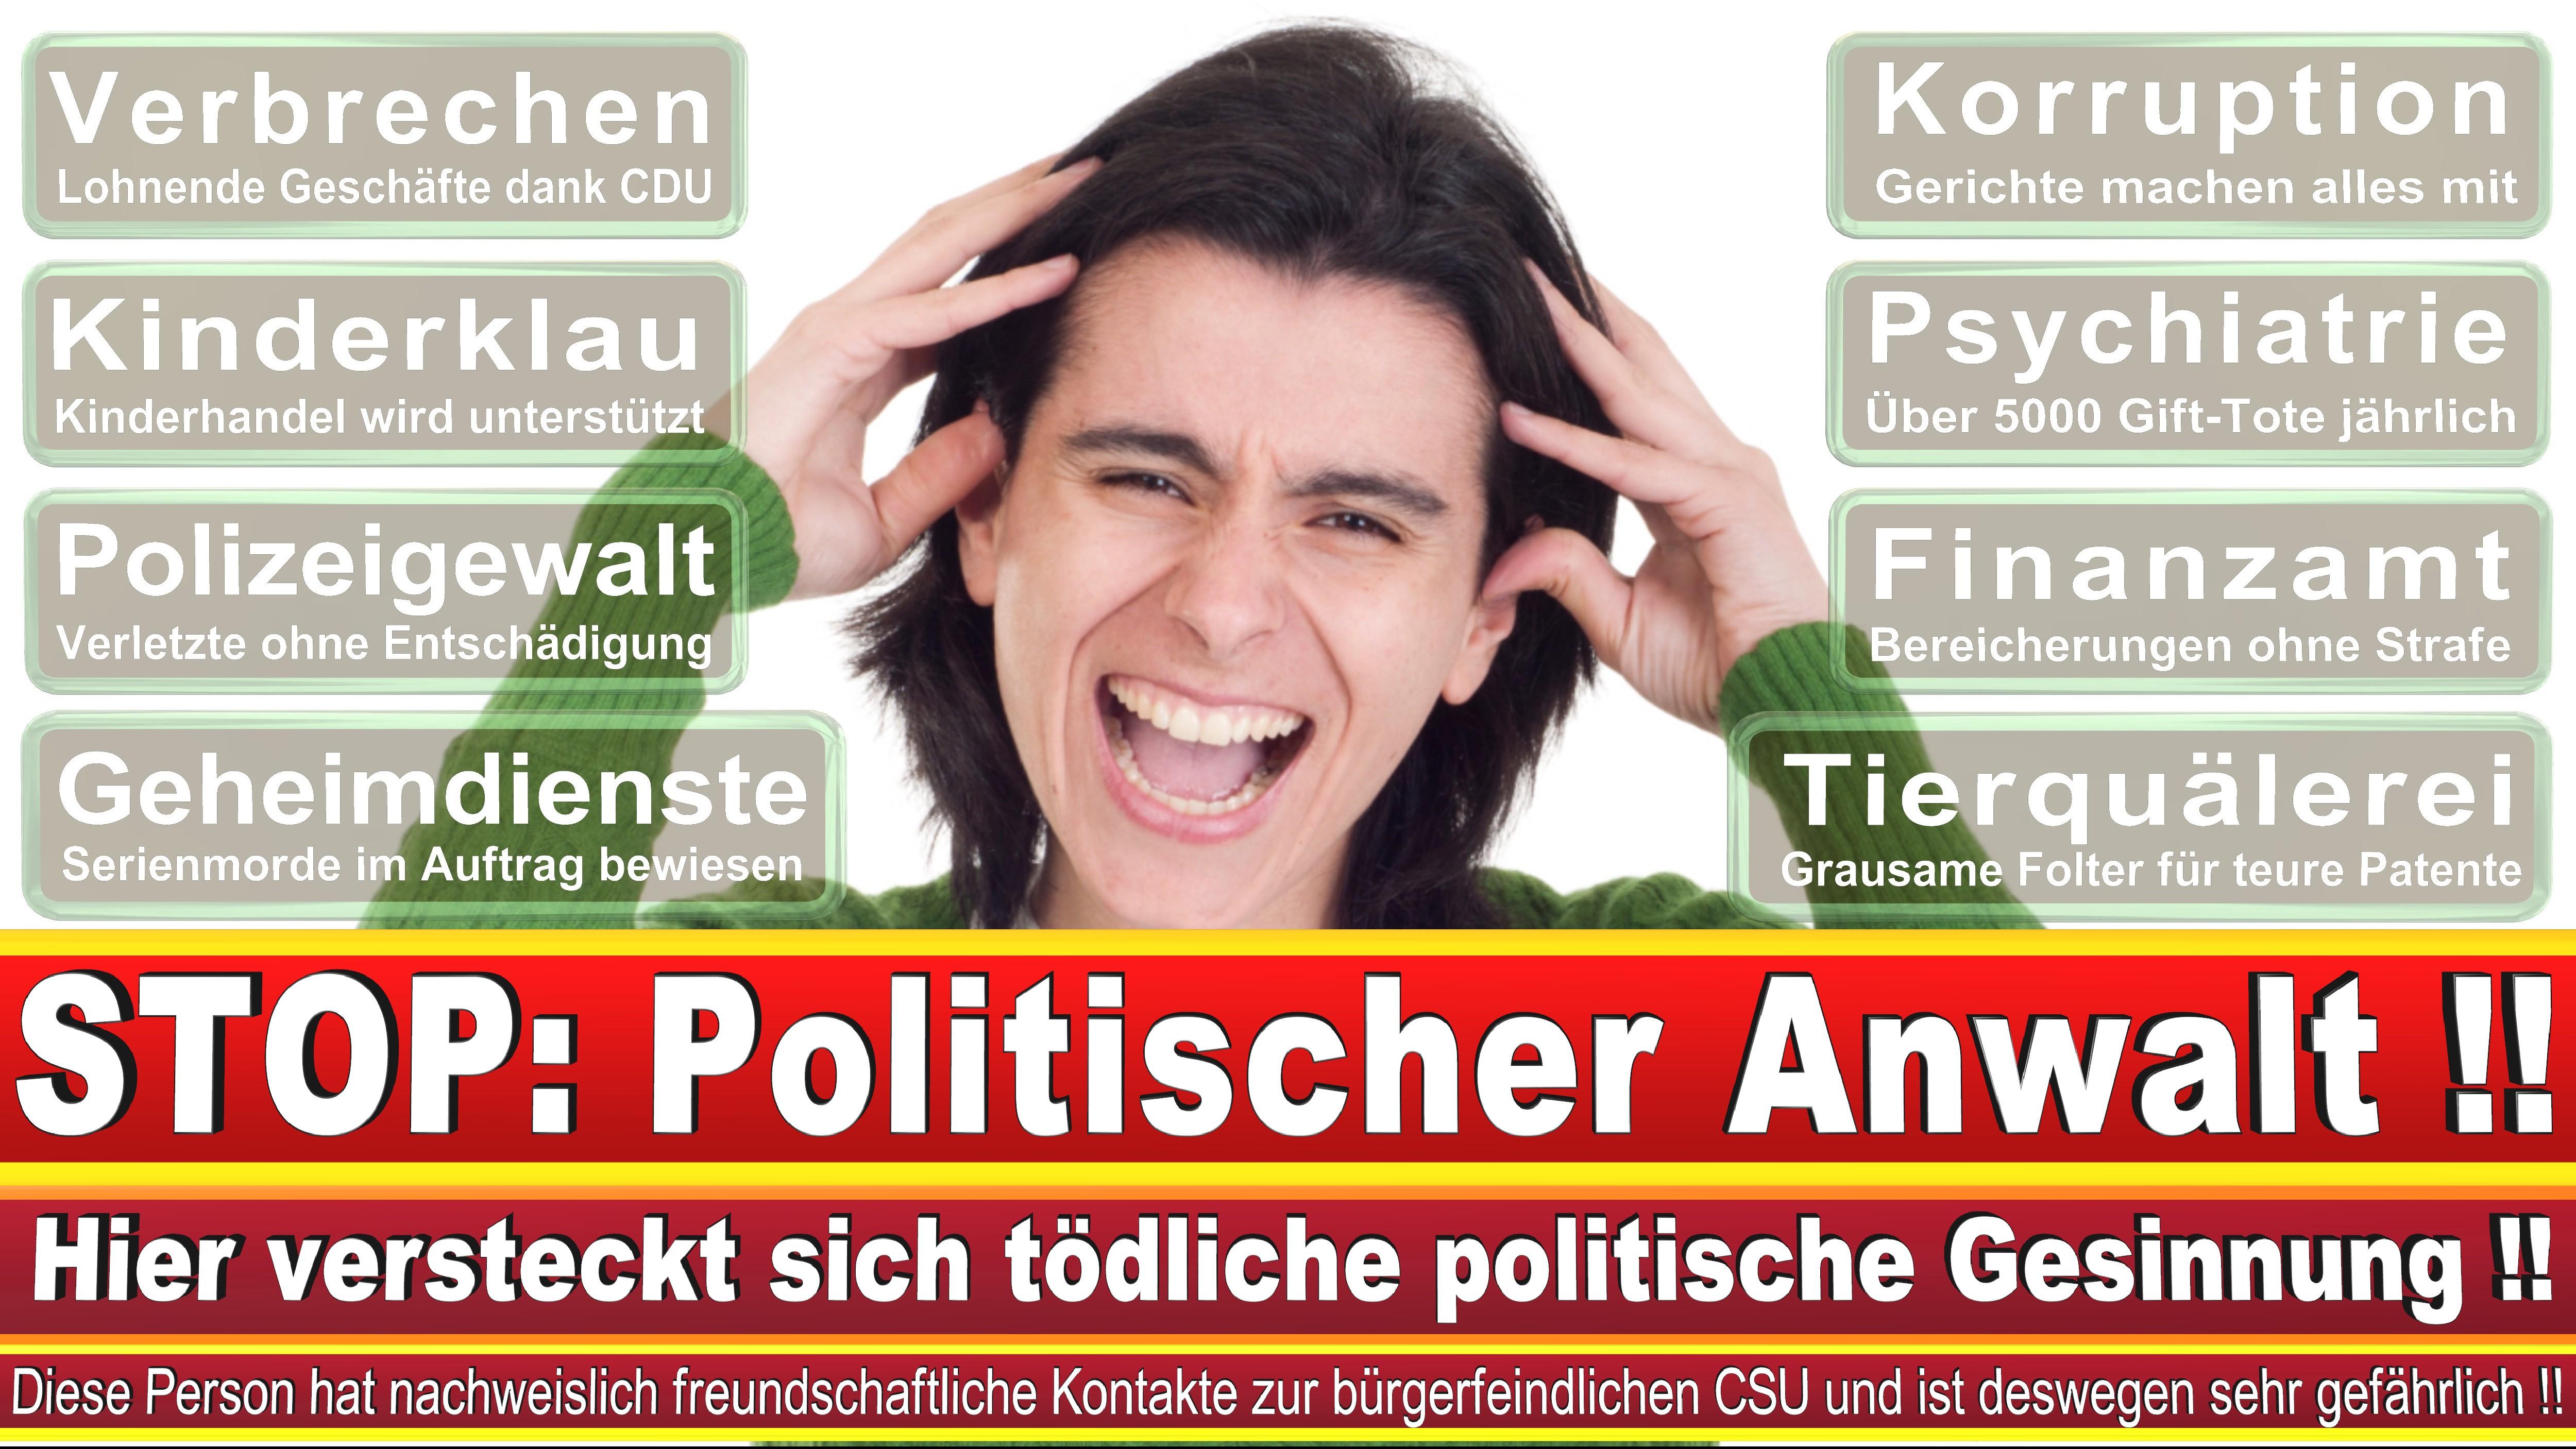 Rechtsanwältin Nicola Mayerl München Selbstständig Rechtsanwältin Rechtsanwaltskanzlei Nicola Mayerl 1